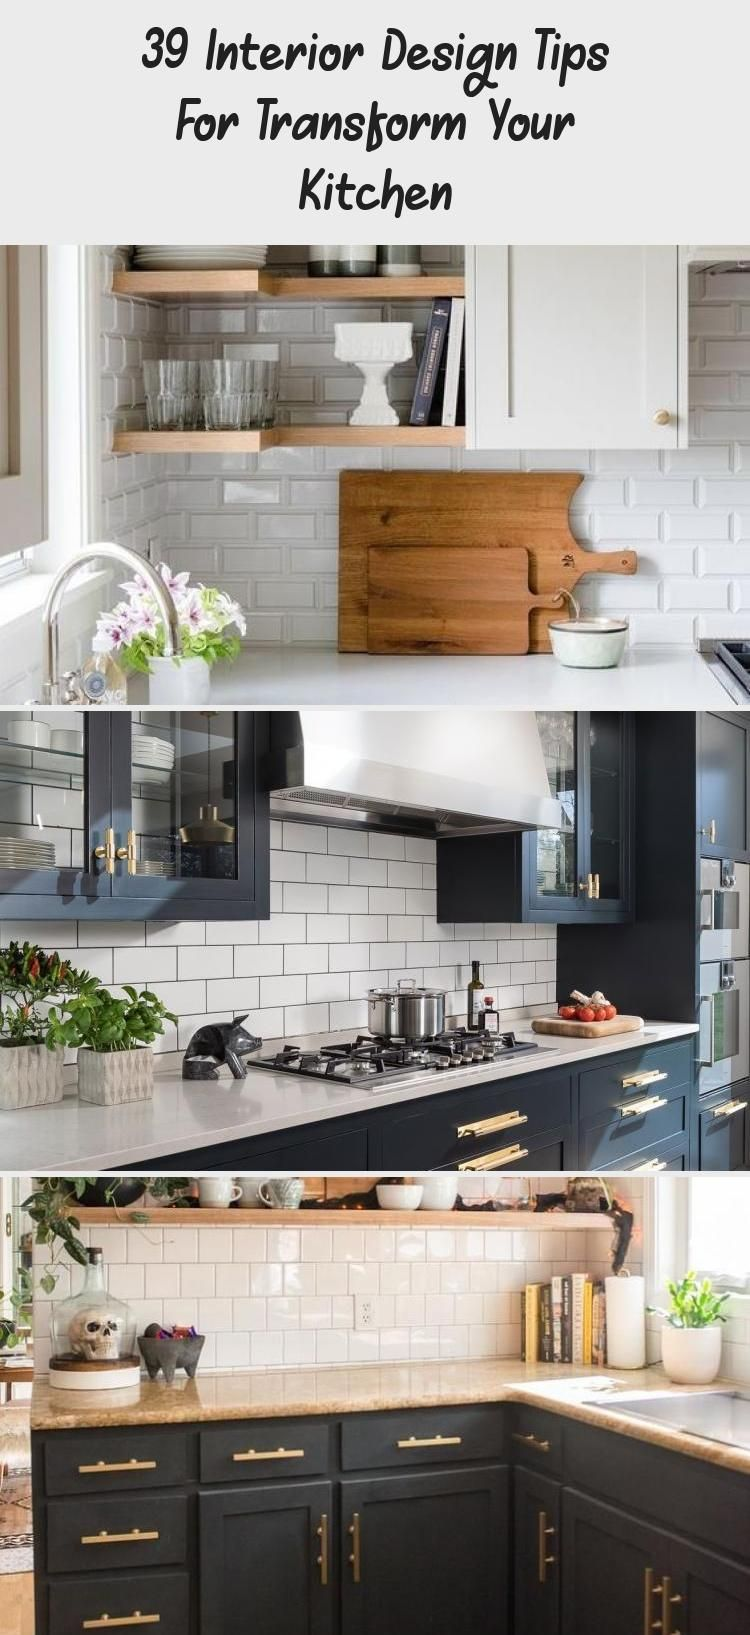 9 Interior Design Tips for Transform Your Kitchen ...